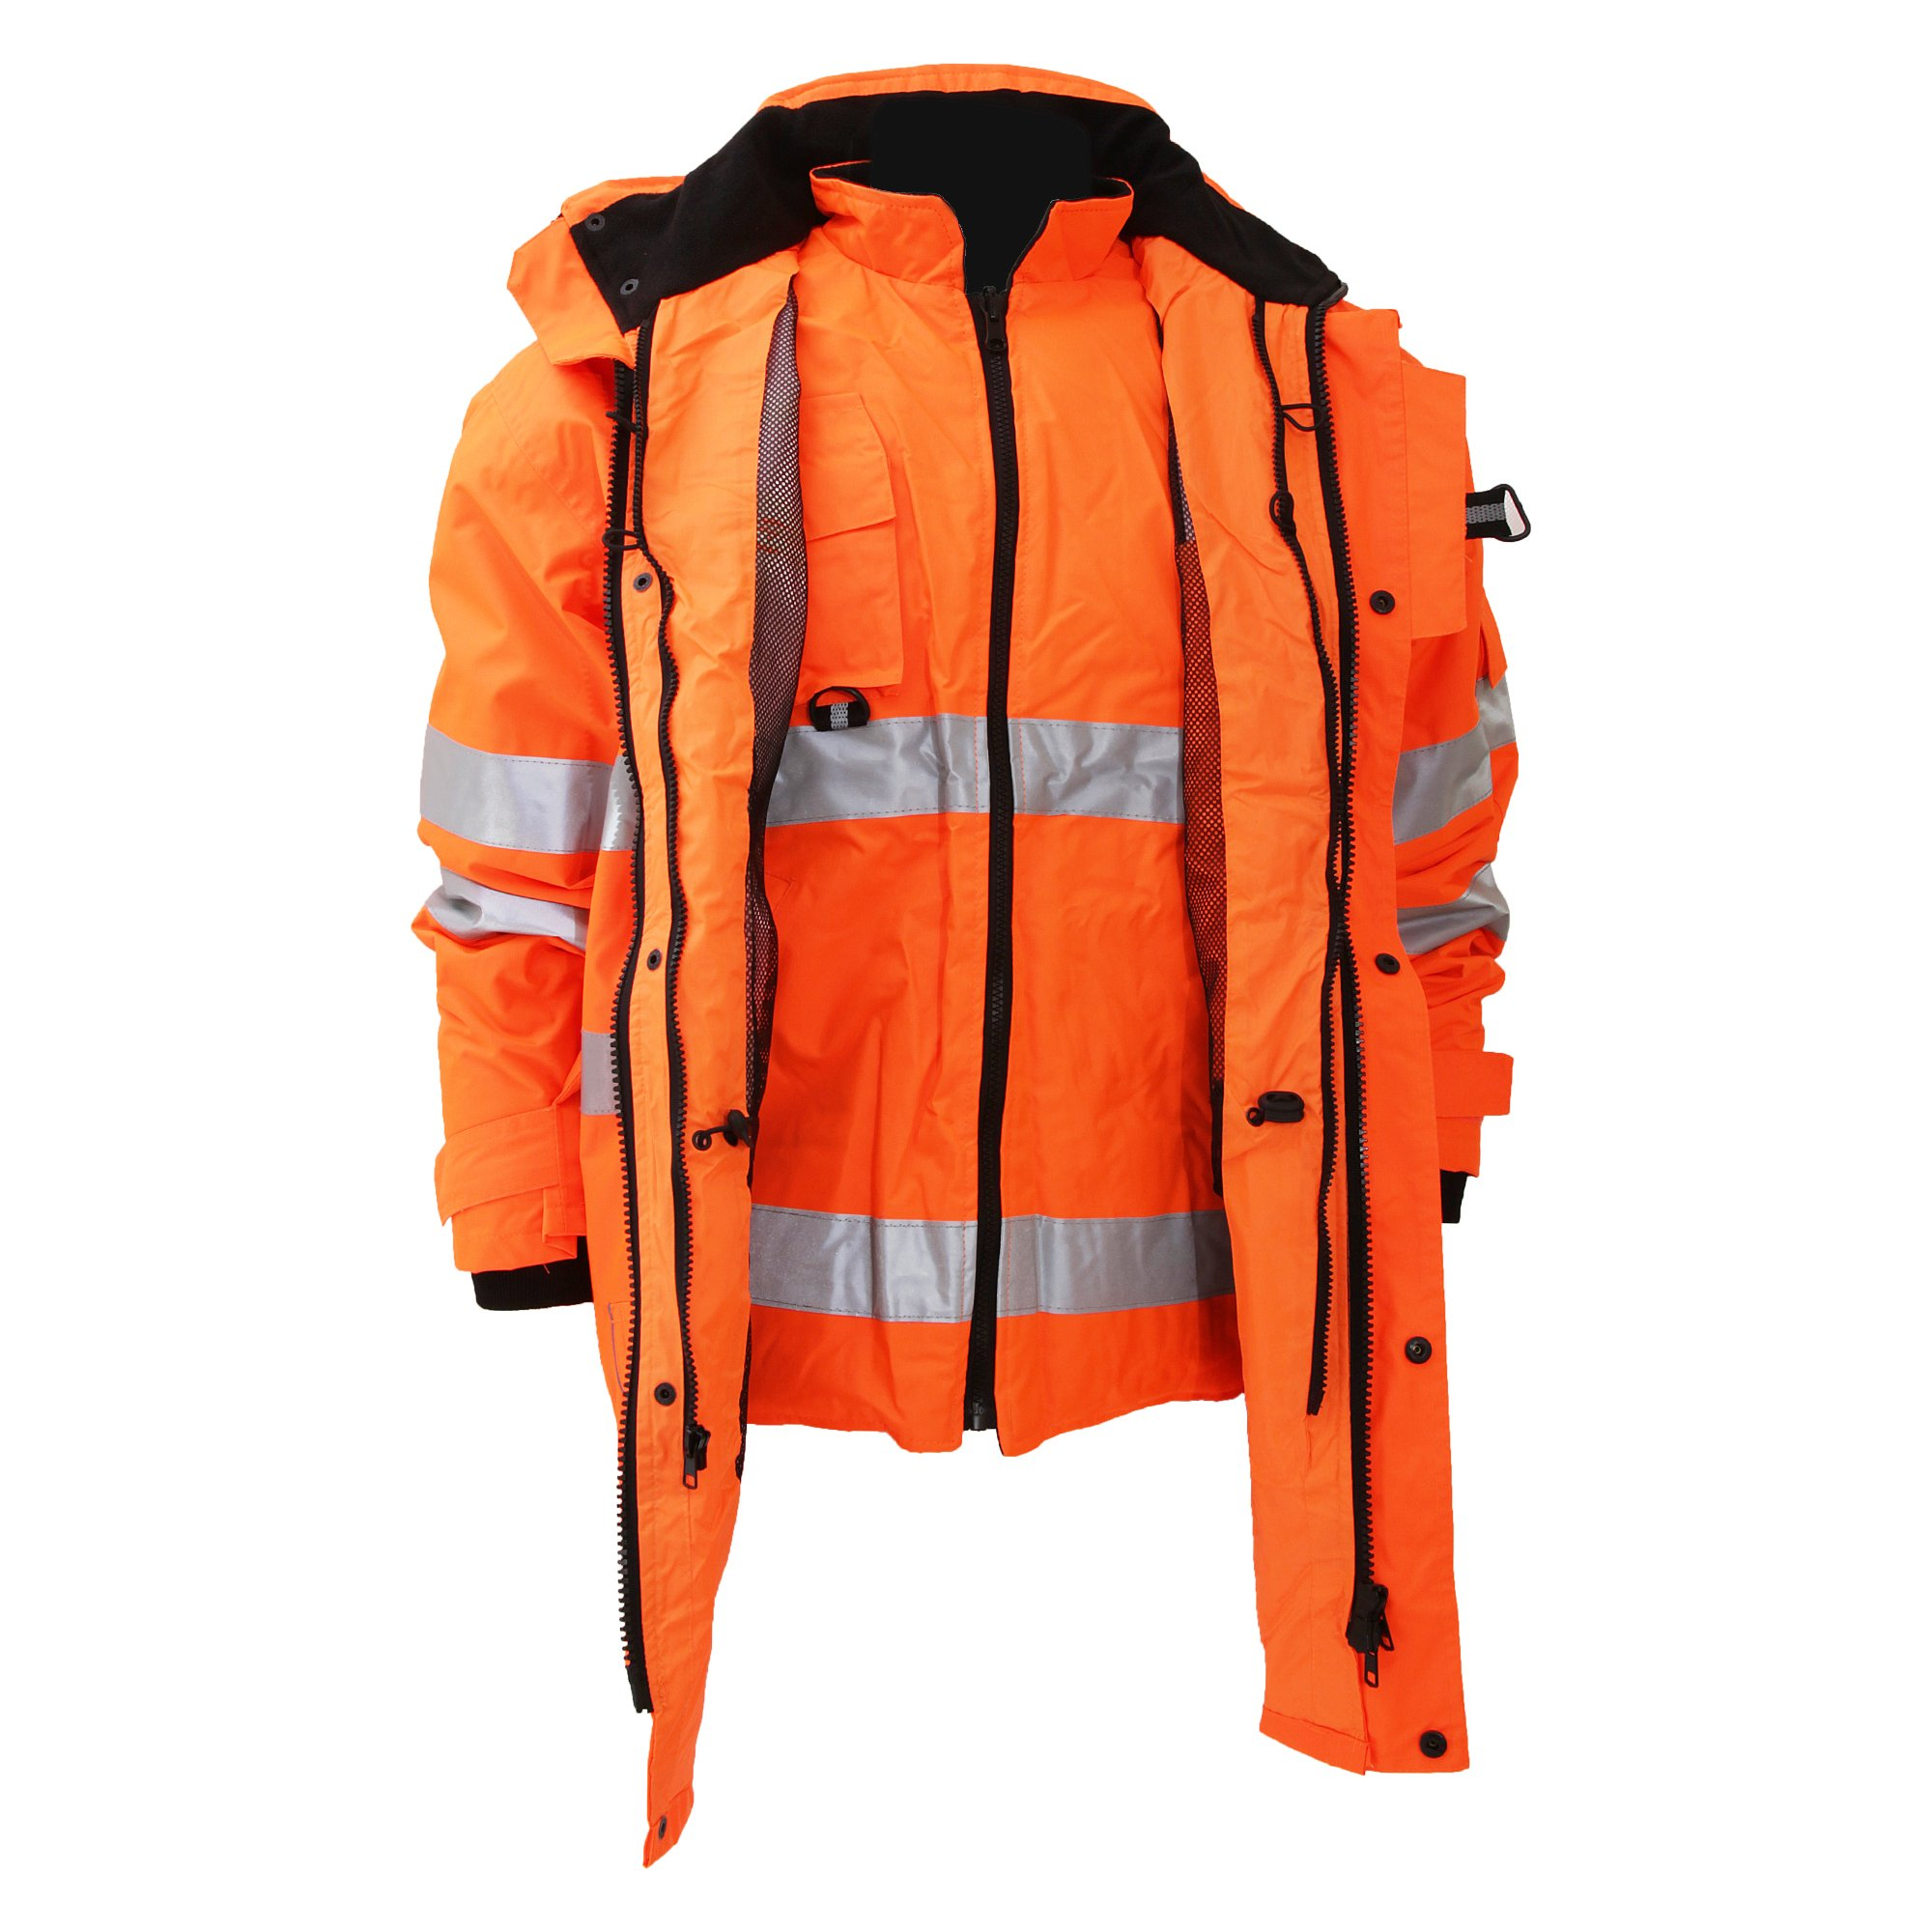 Yoko Hi-Vis Multi-Function 7-In-1 Jacket Safety Workwear Mens Reflective Viz Top